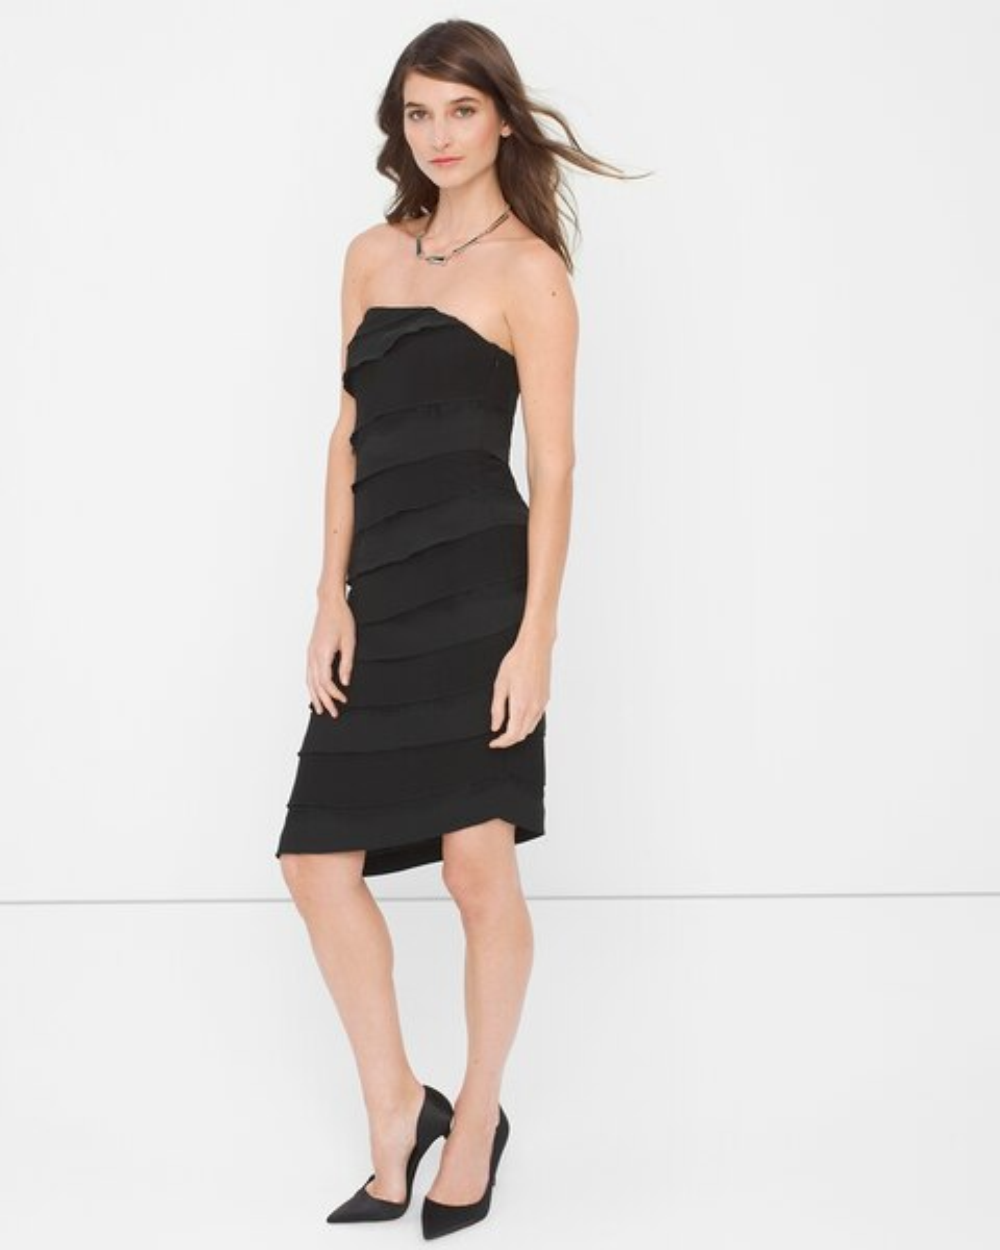 Strapless Black Lace Tiered Sheath Dress White House Black Market